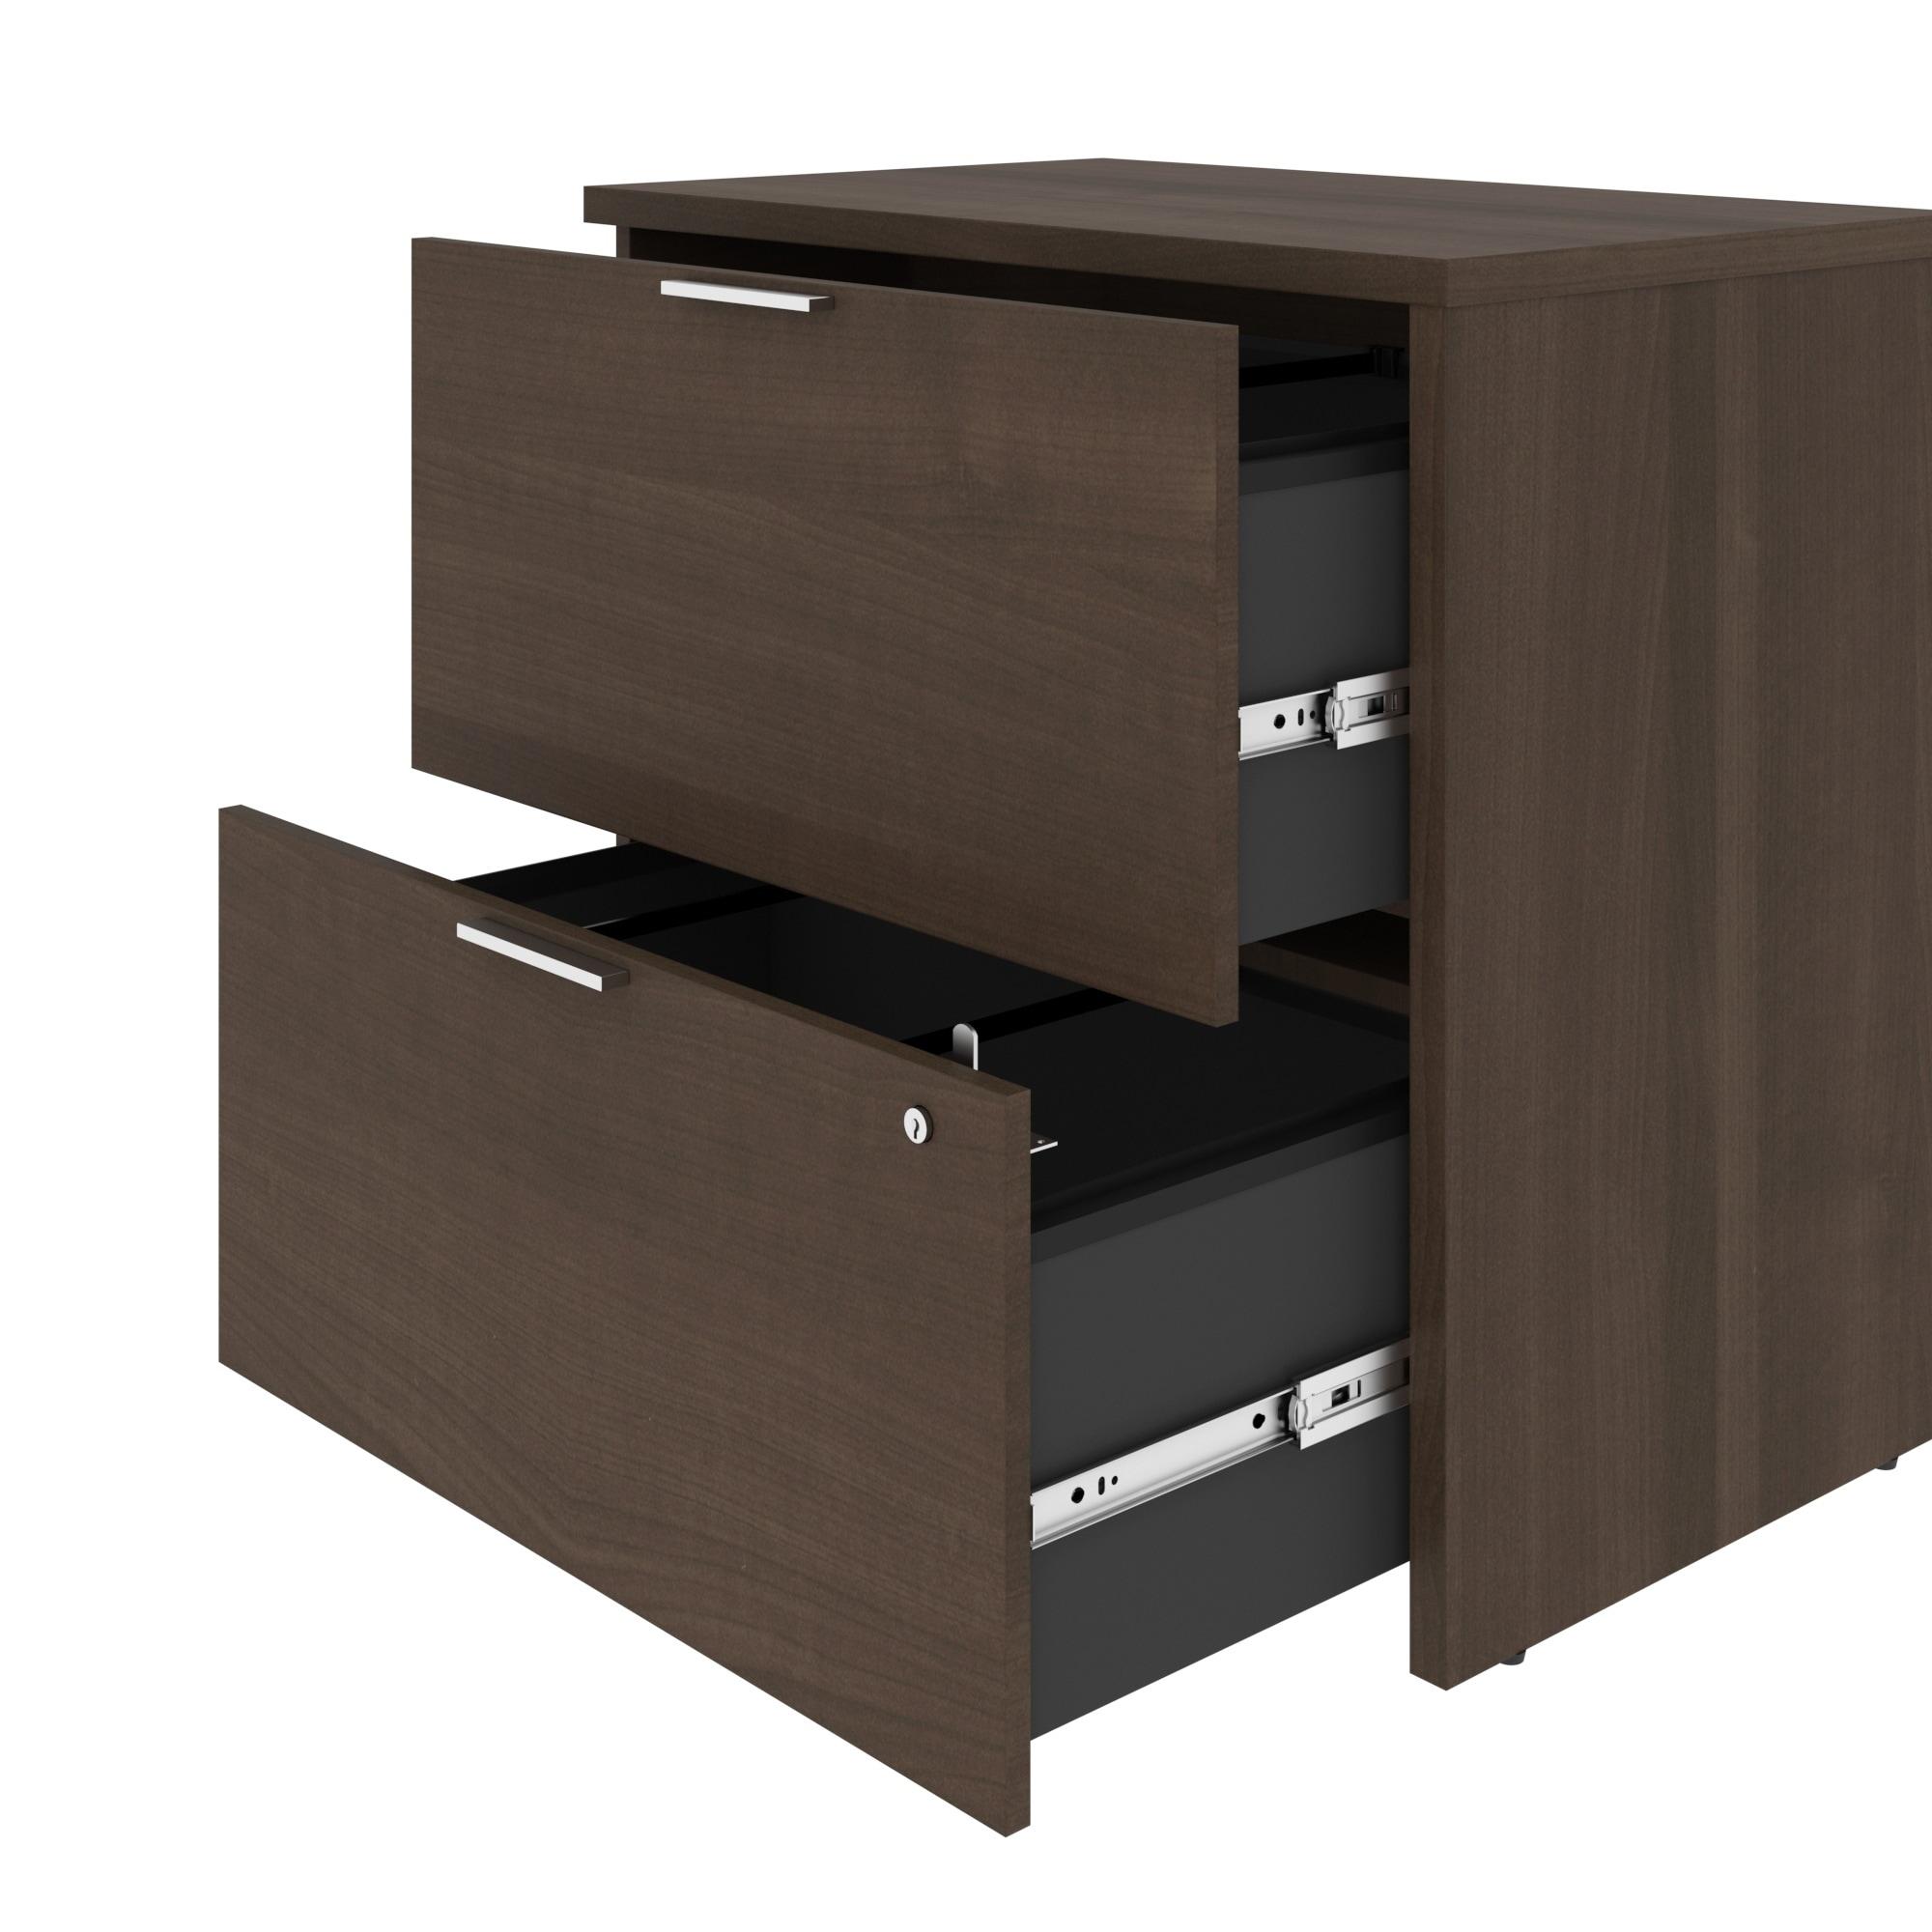 Image of: Shop Black Friday Deals On Bestar Gemma Lateral File Cabinet Overstock 30269975